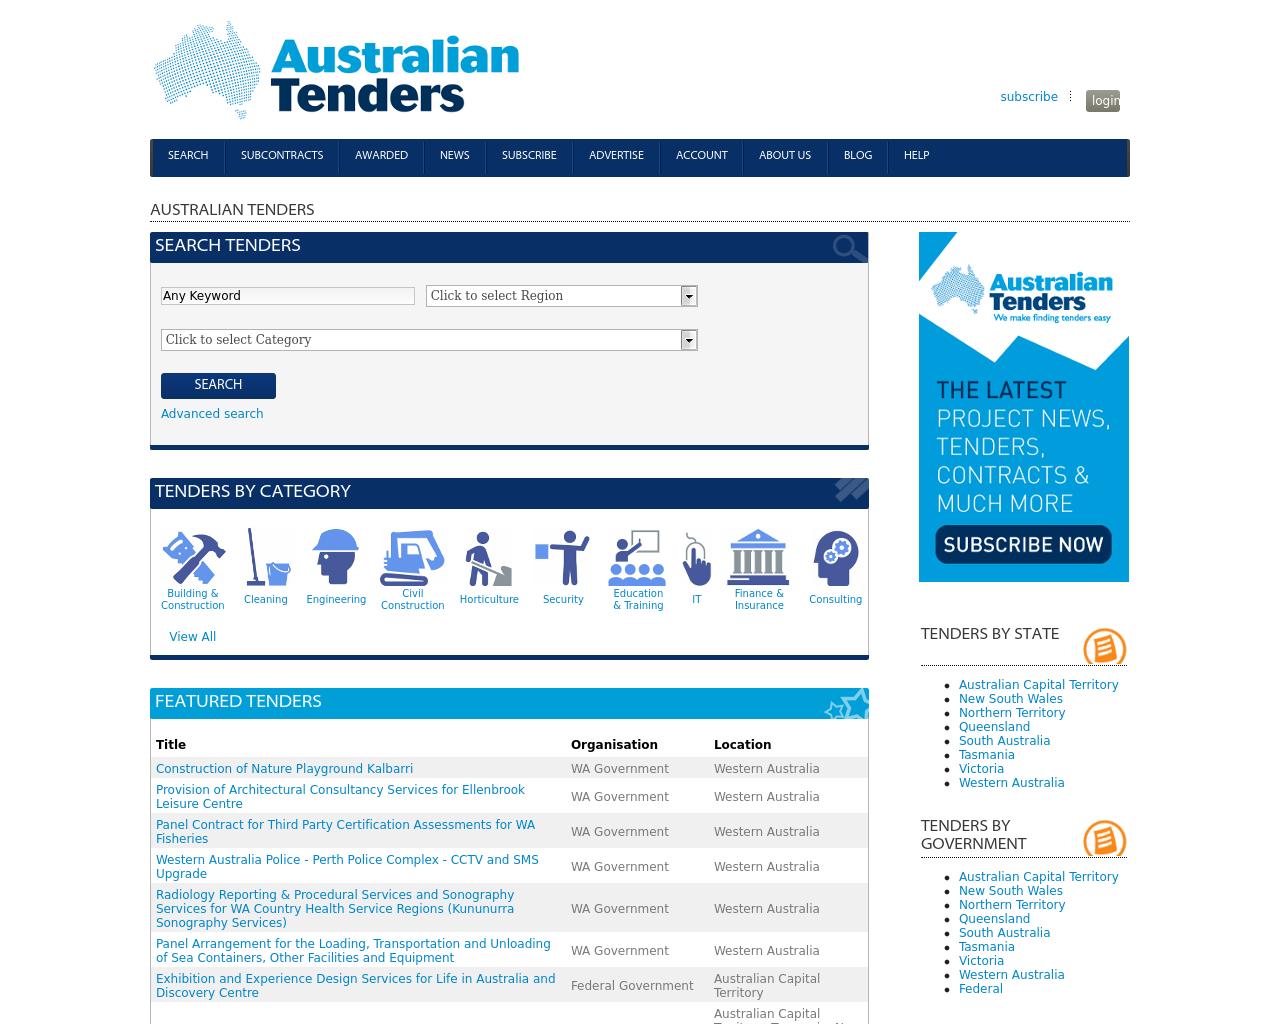 AustralianTenders.com-Advertising-Reviews-Pricing